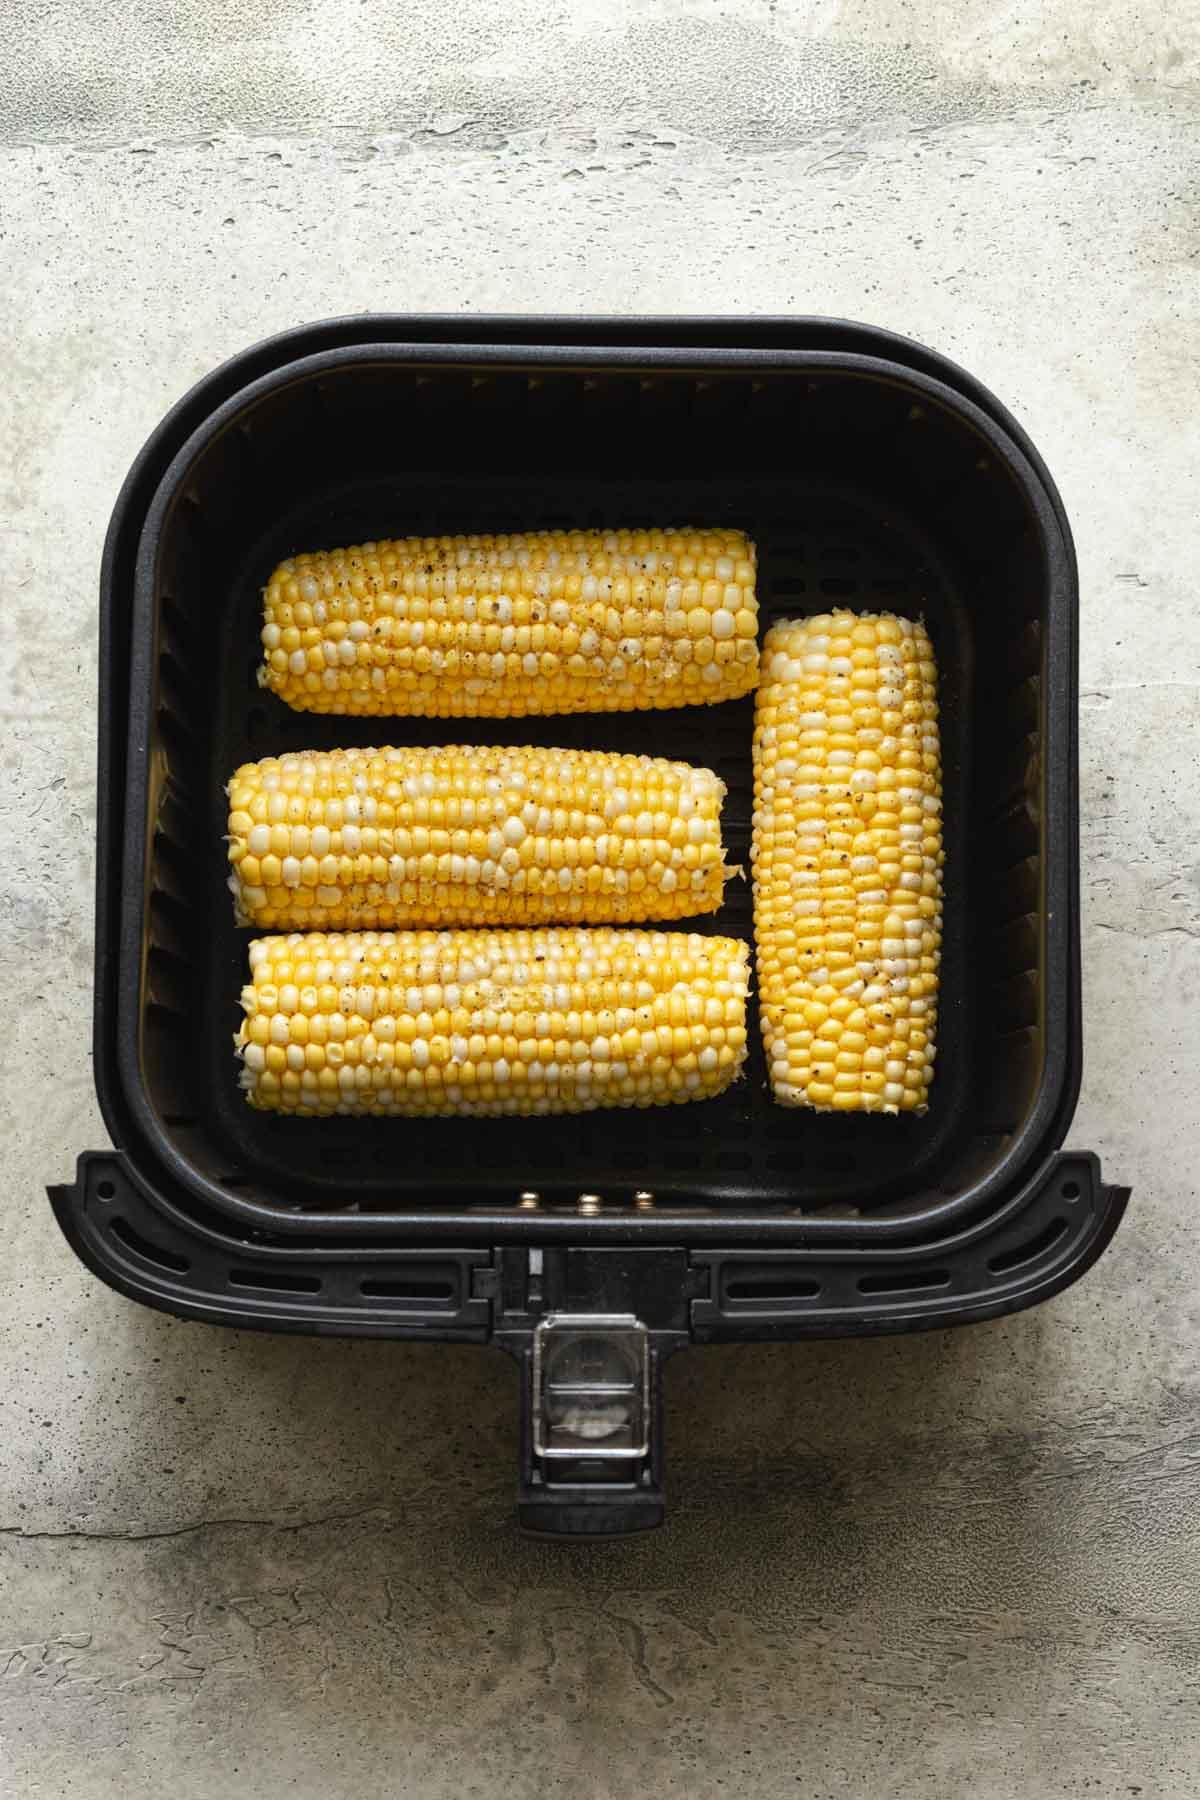 Four ears of raw, fresh corn arranged in an air fryer basket.